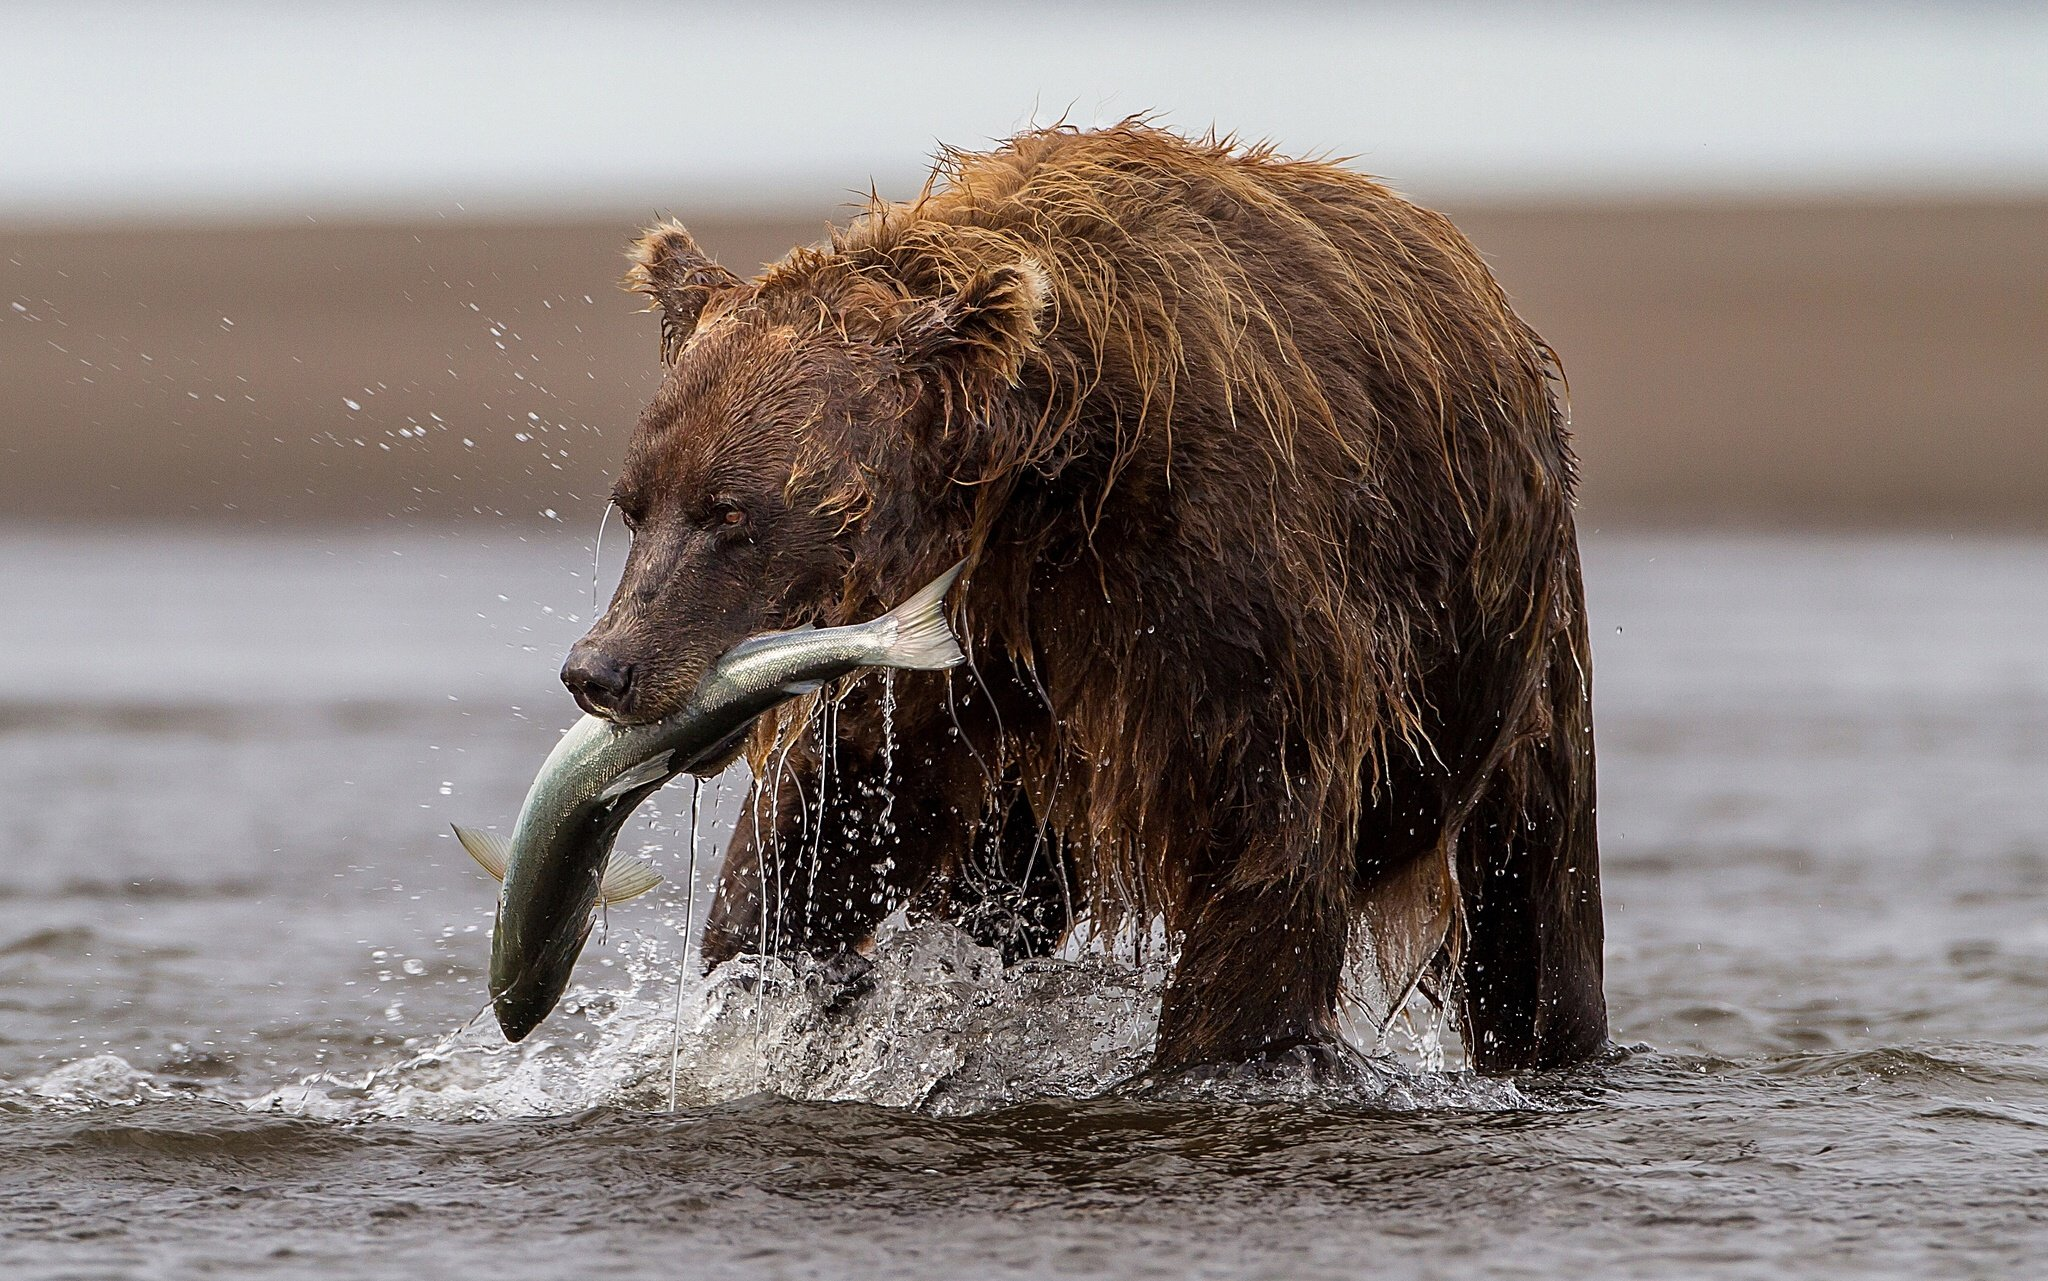 Bear fish trout river catch fishing wallpaper 2048x1281 for Bear catching fish